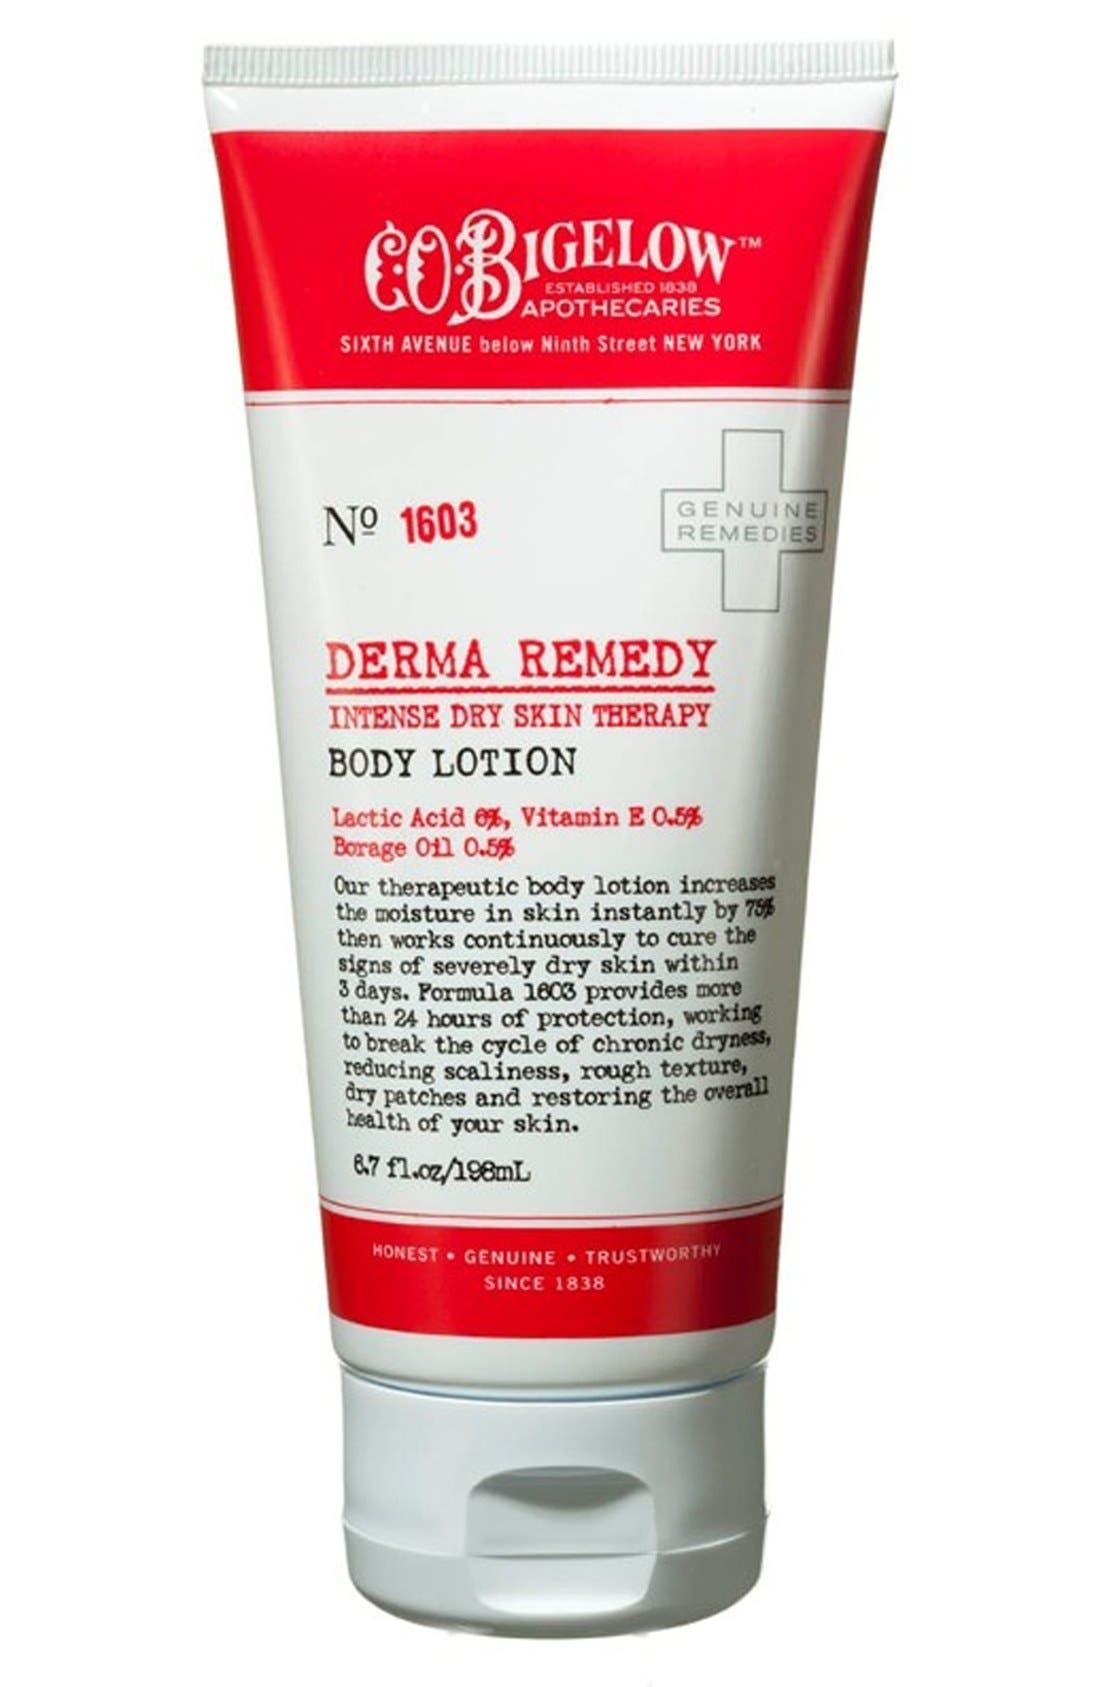 C.O. Bigelow® Derma Remedy Body Lotion